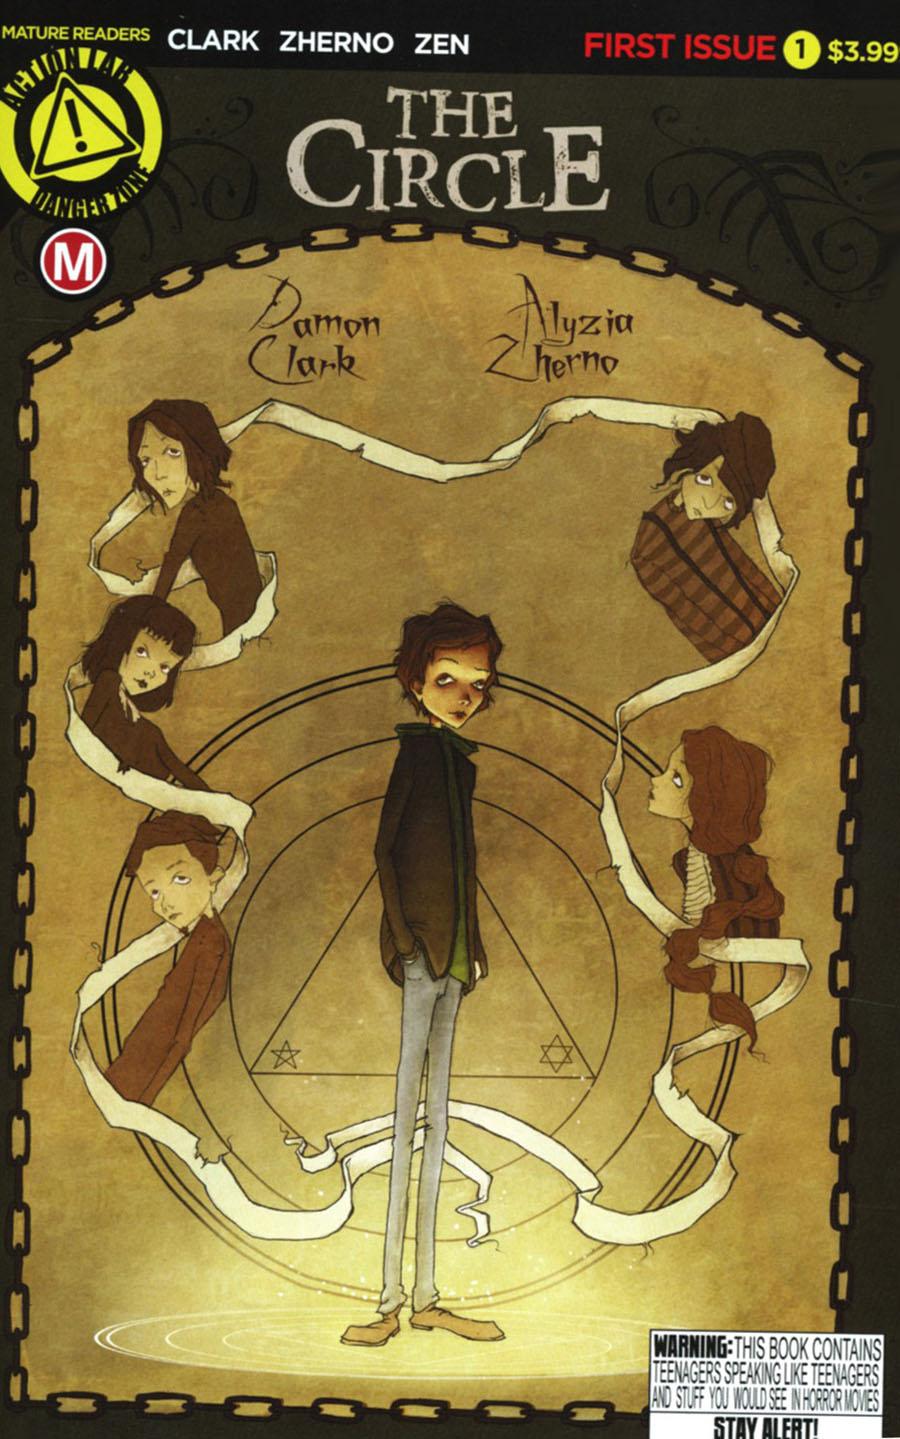 Circle (Danger Zone) #1 Cover A Regular Alyzia Zherno Cover